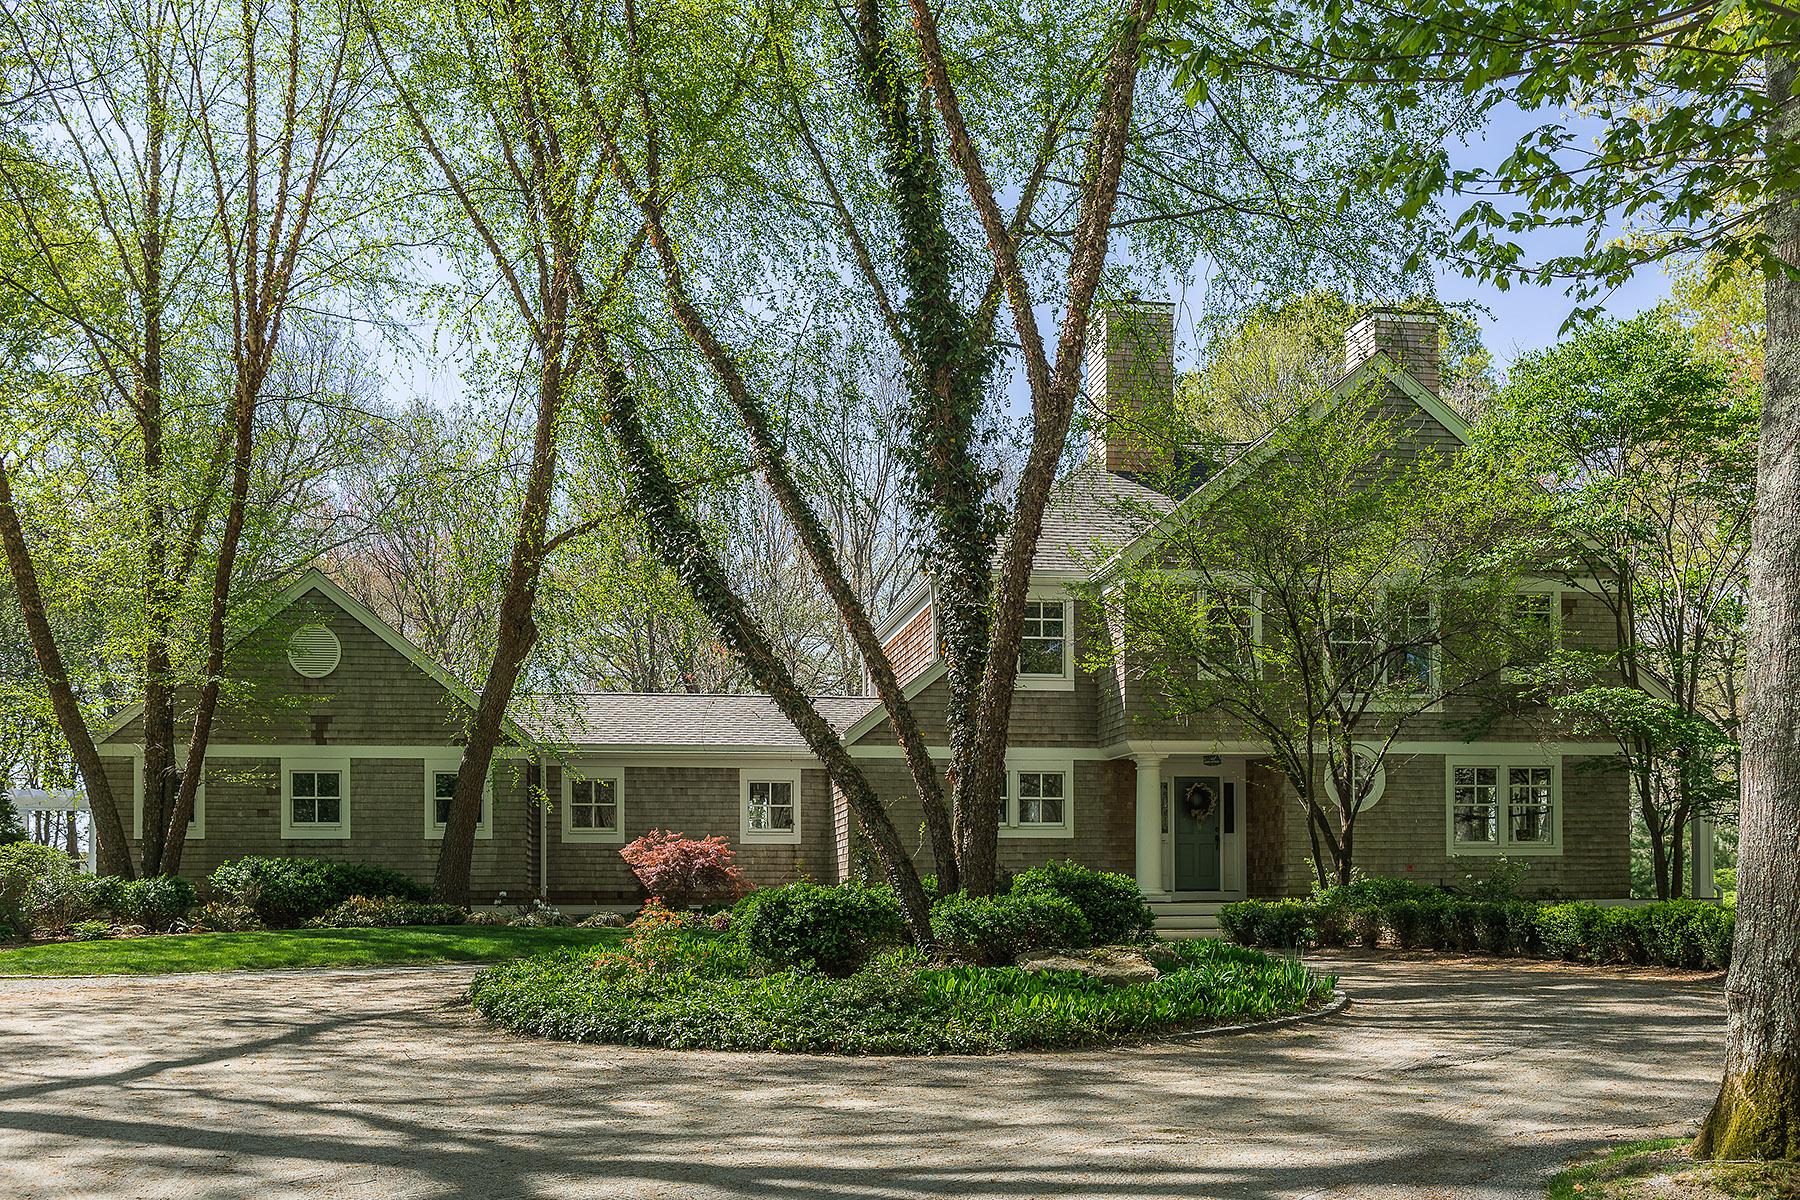 sales property at 125 Fresh Meadow Rd, South Kingstown, RI